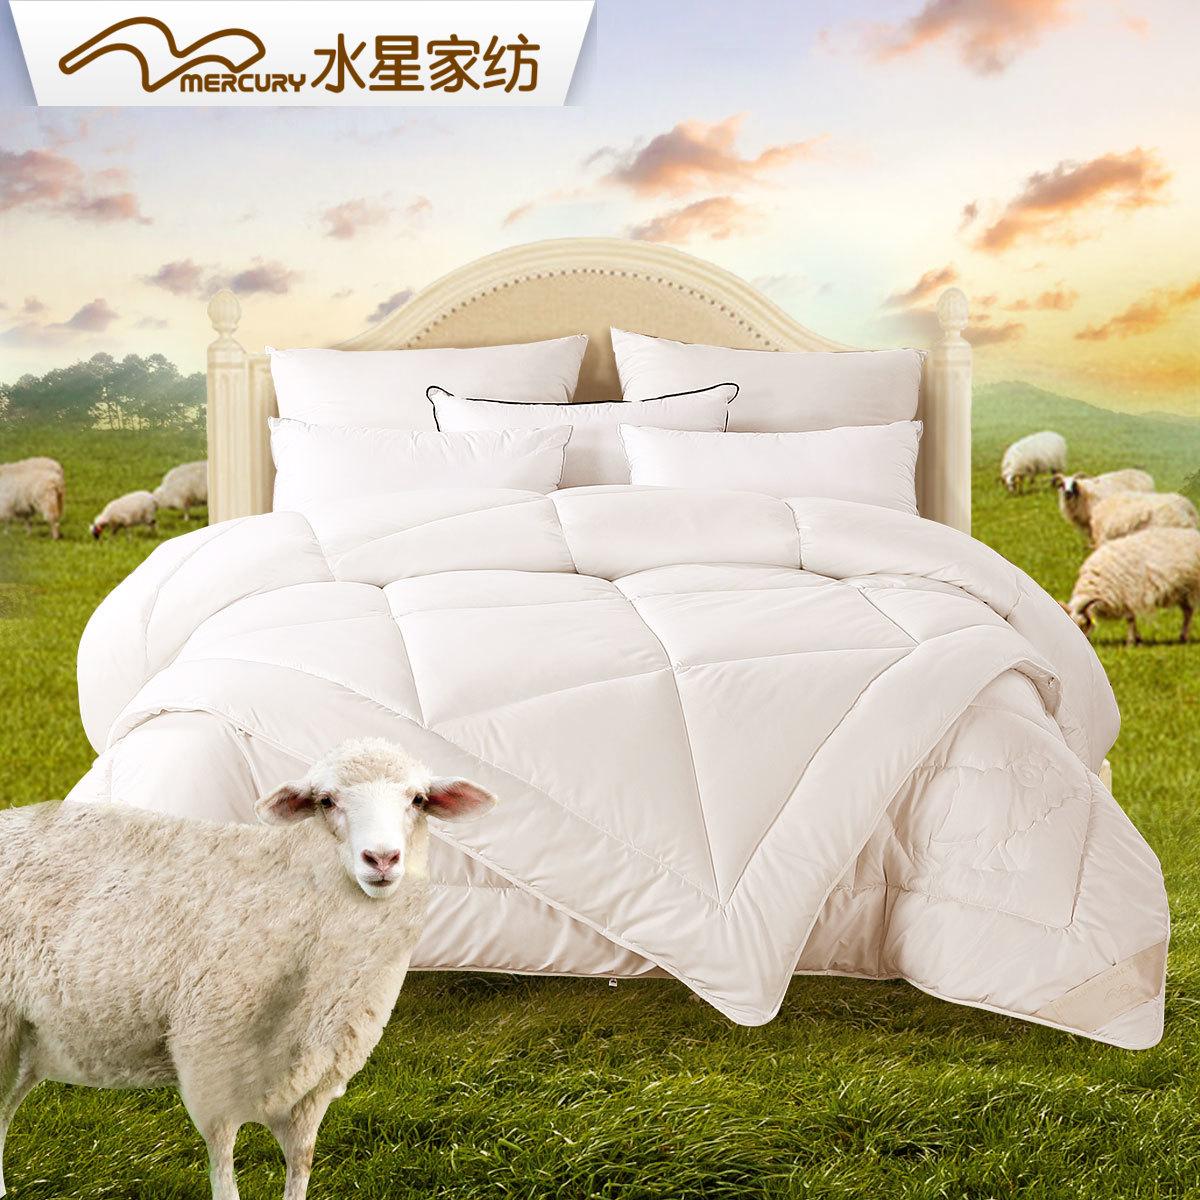 Одеяла из шерсти Артикул 18066027269